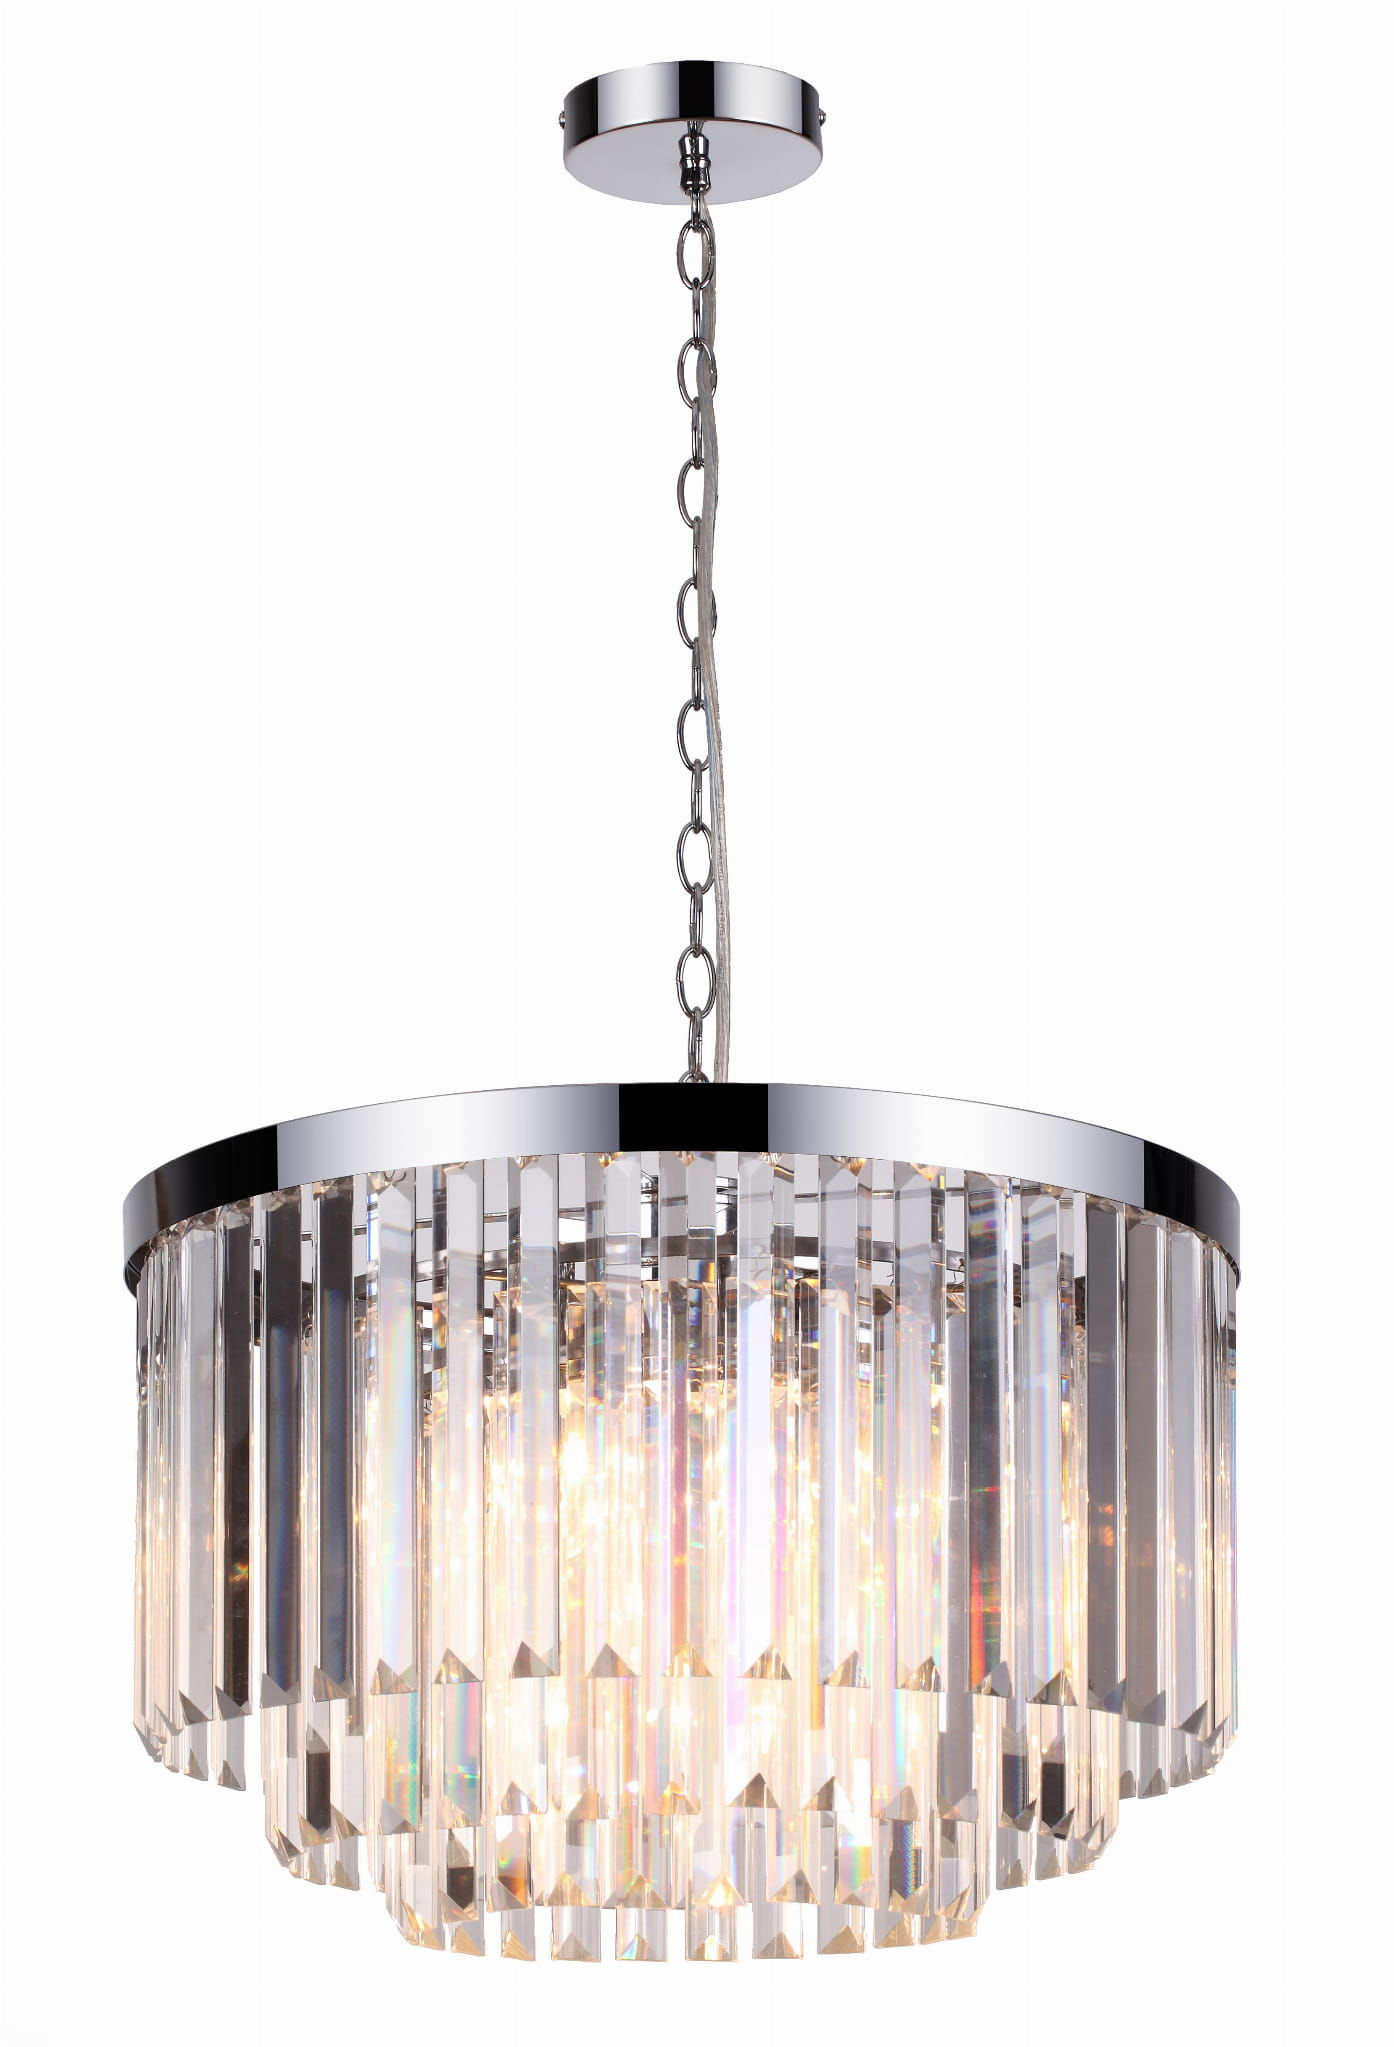 Light Prestige Vetro LP-2910/5P lampa wisząca metalowa klosz szklany transparentny kryształy 5xE14 45 cm